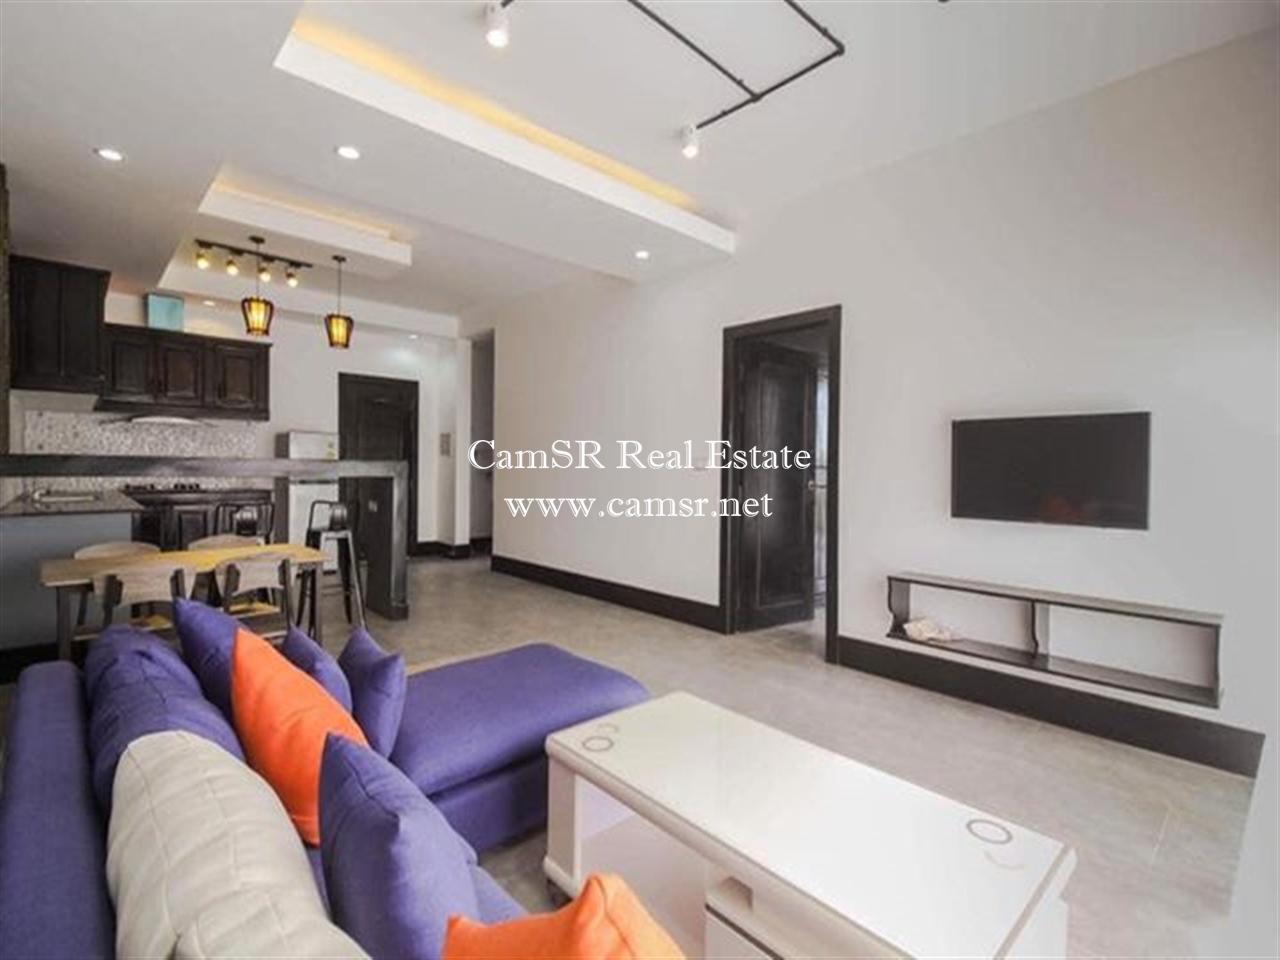 Apartment for Rent in Siem Reap-Slor Kram